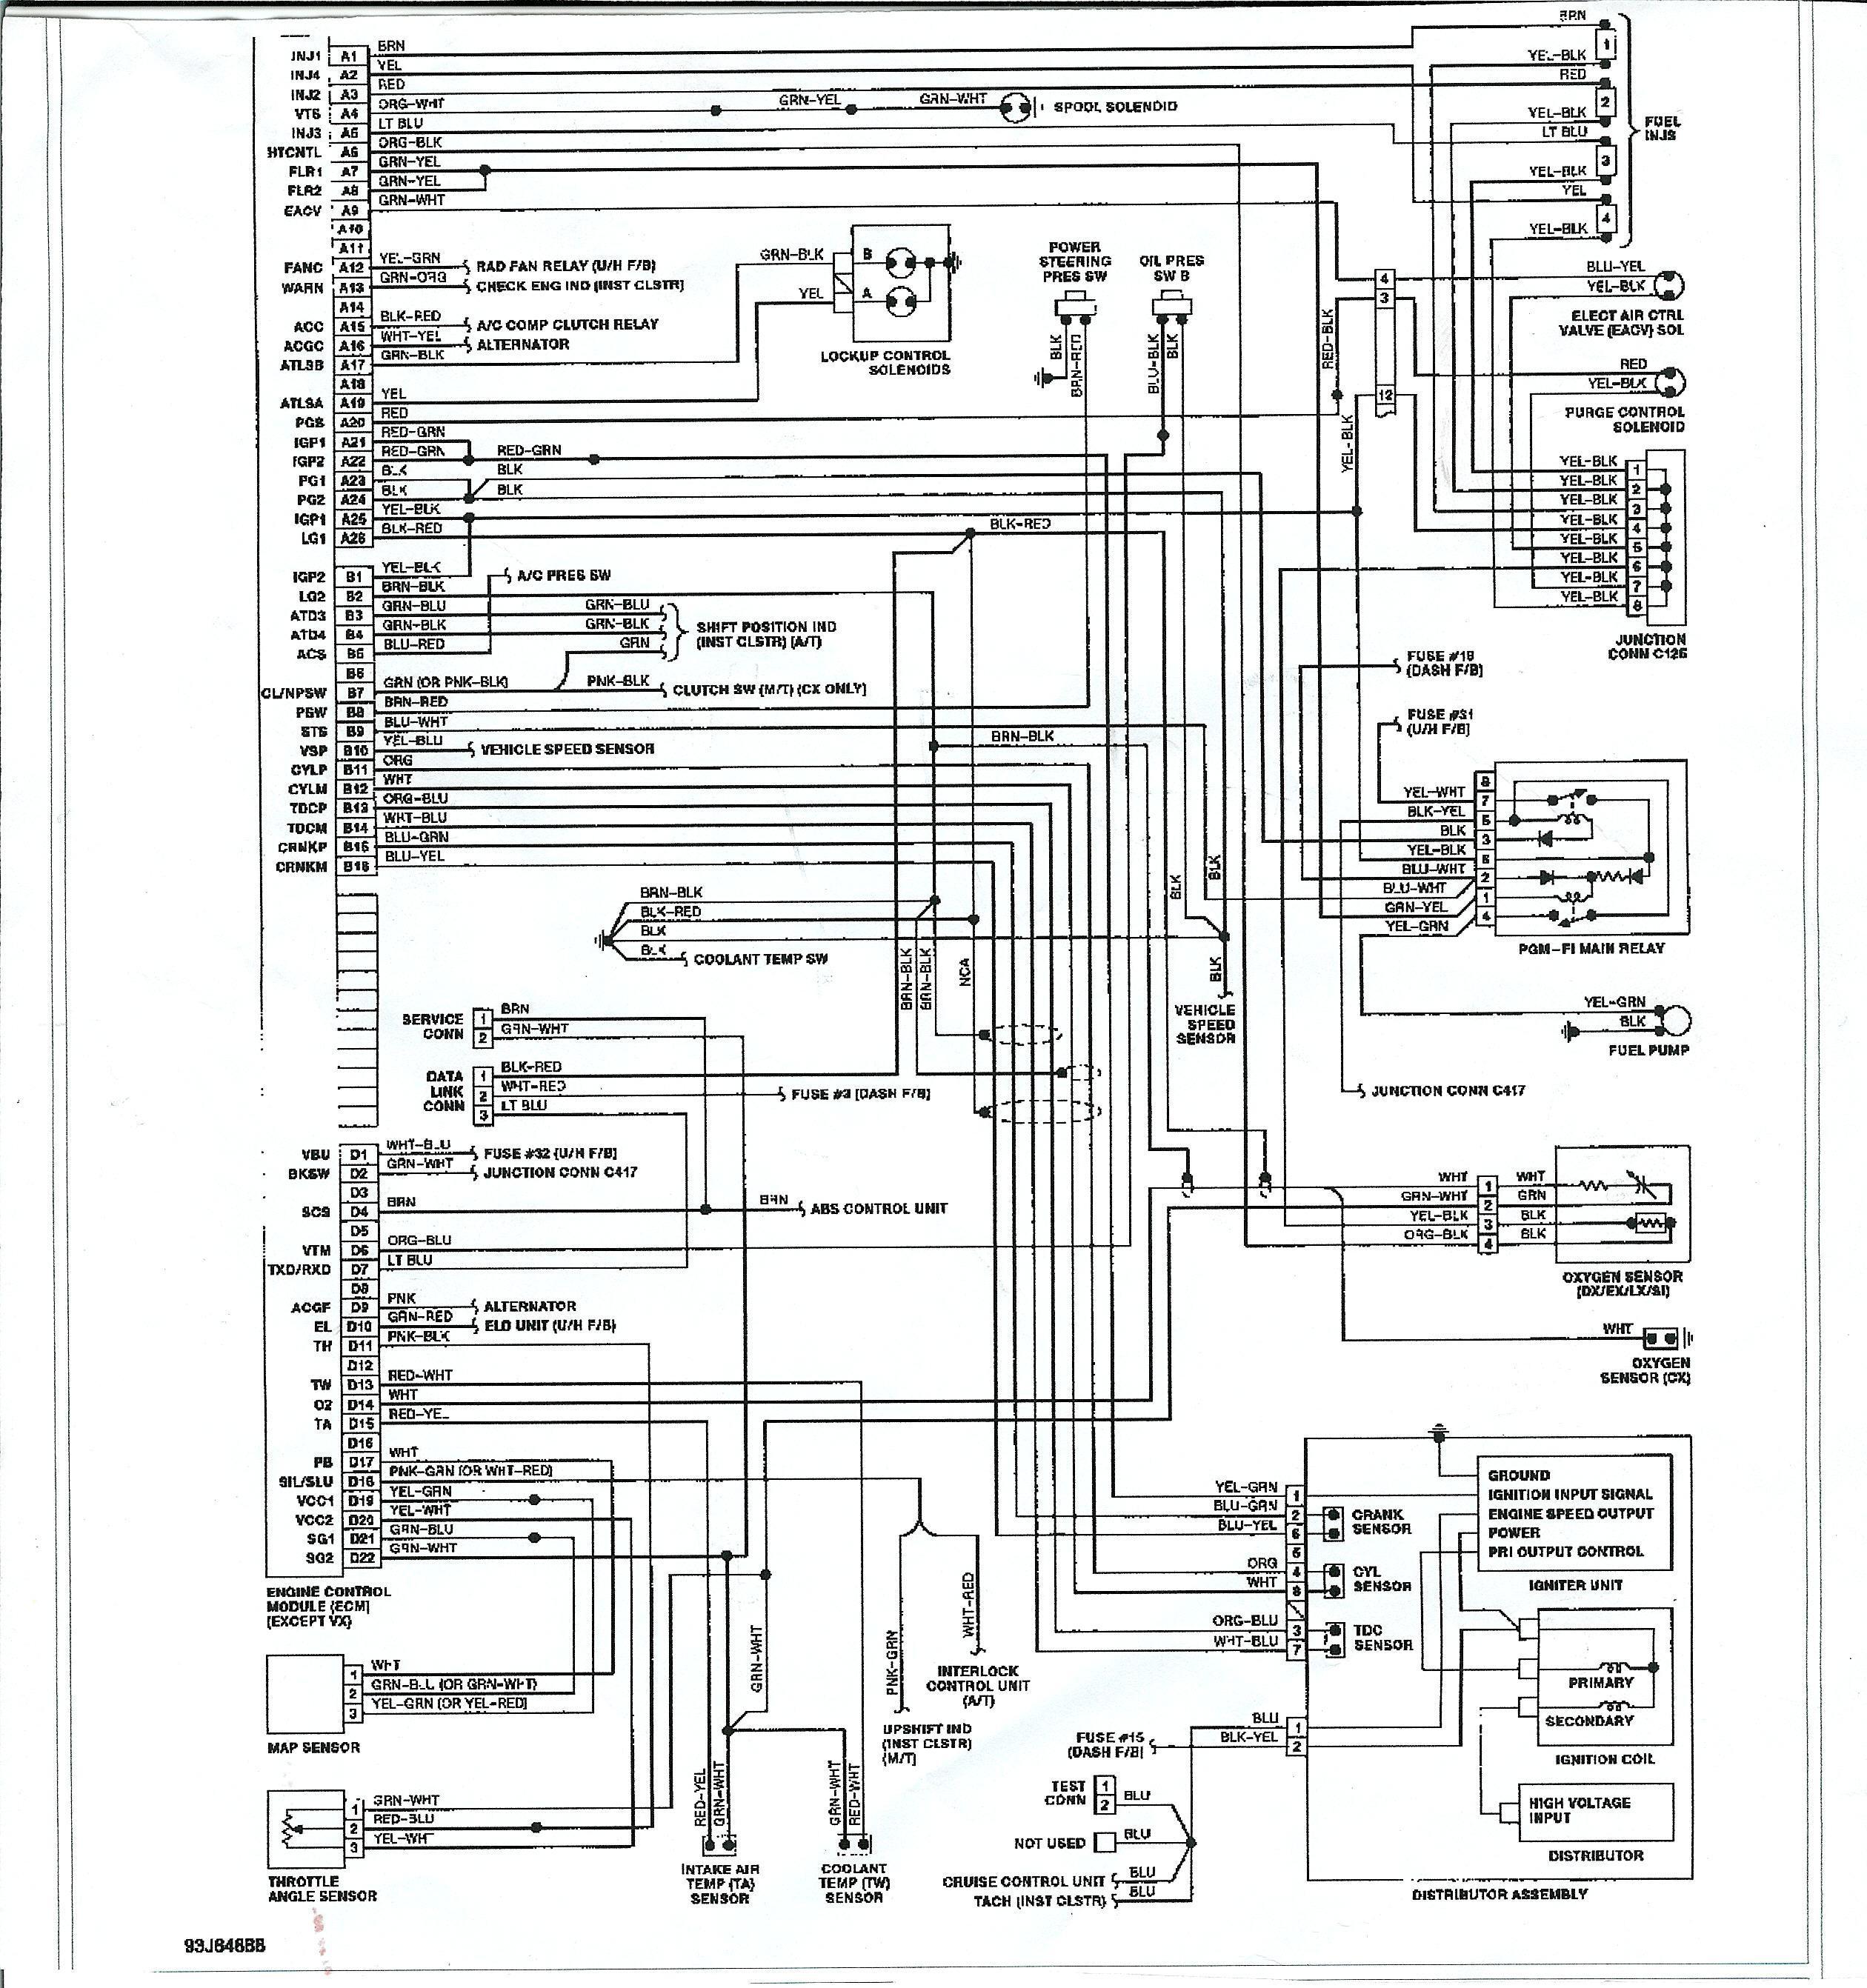 2002 Honda Civic Wiring Schematics Cw 2700] Honda Civic Wiring Diagram Honda Civic Ignition Of 2002 Honda Civic Wiring Schematics